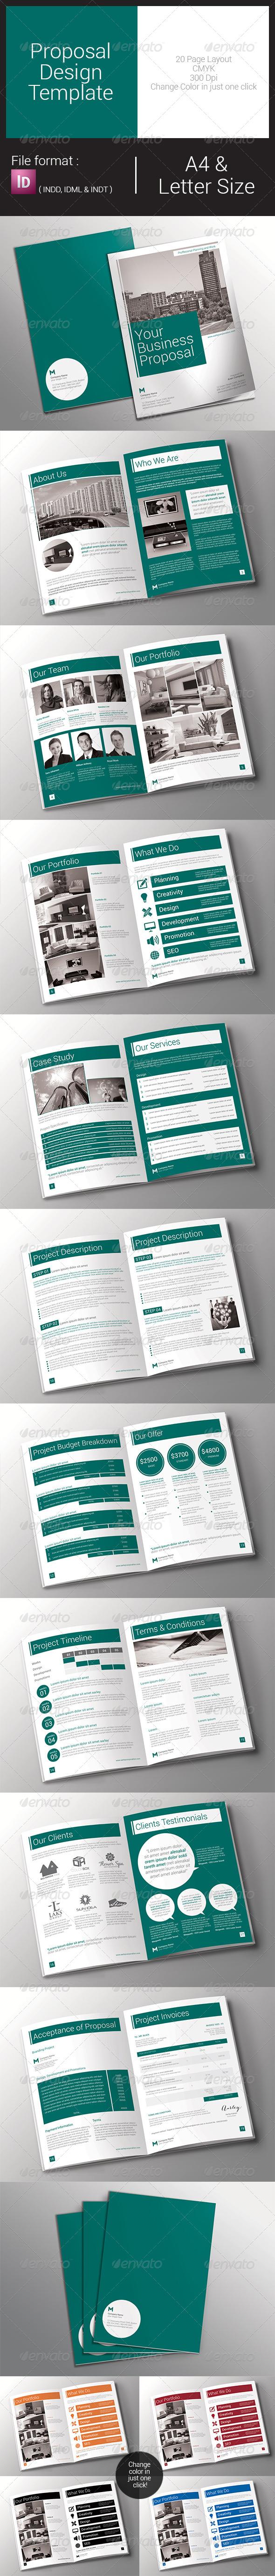 GraphicRiver Proposal Design Template 7852770